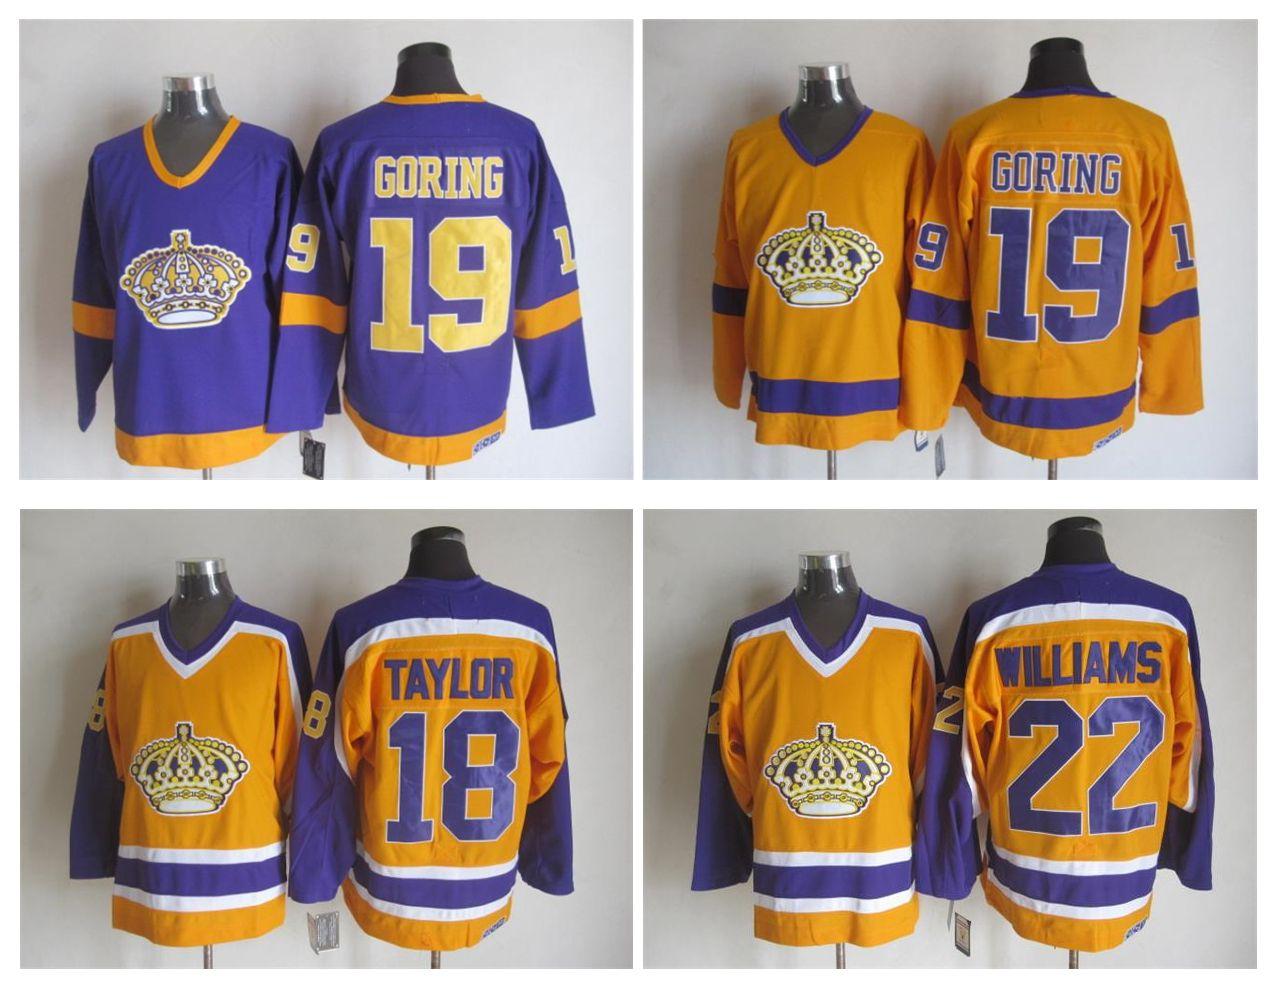 premium selection 813fb 5d07b Retro Los Angeles Kings Hockey Jersey 18 Dave Taylor 22 Tiger Williams 19  Butch Goring LA Vintage CCM Authentic Stitched Jerseys